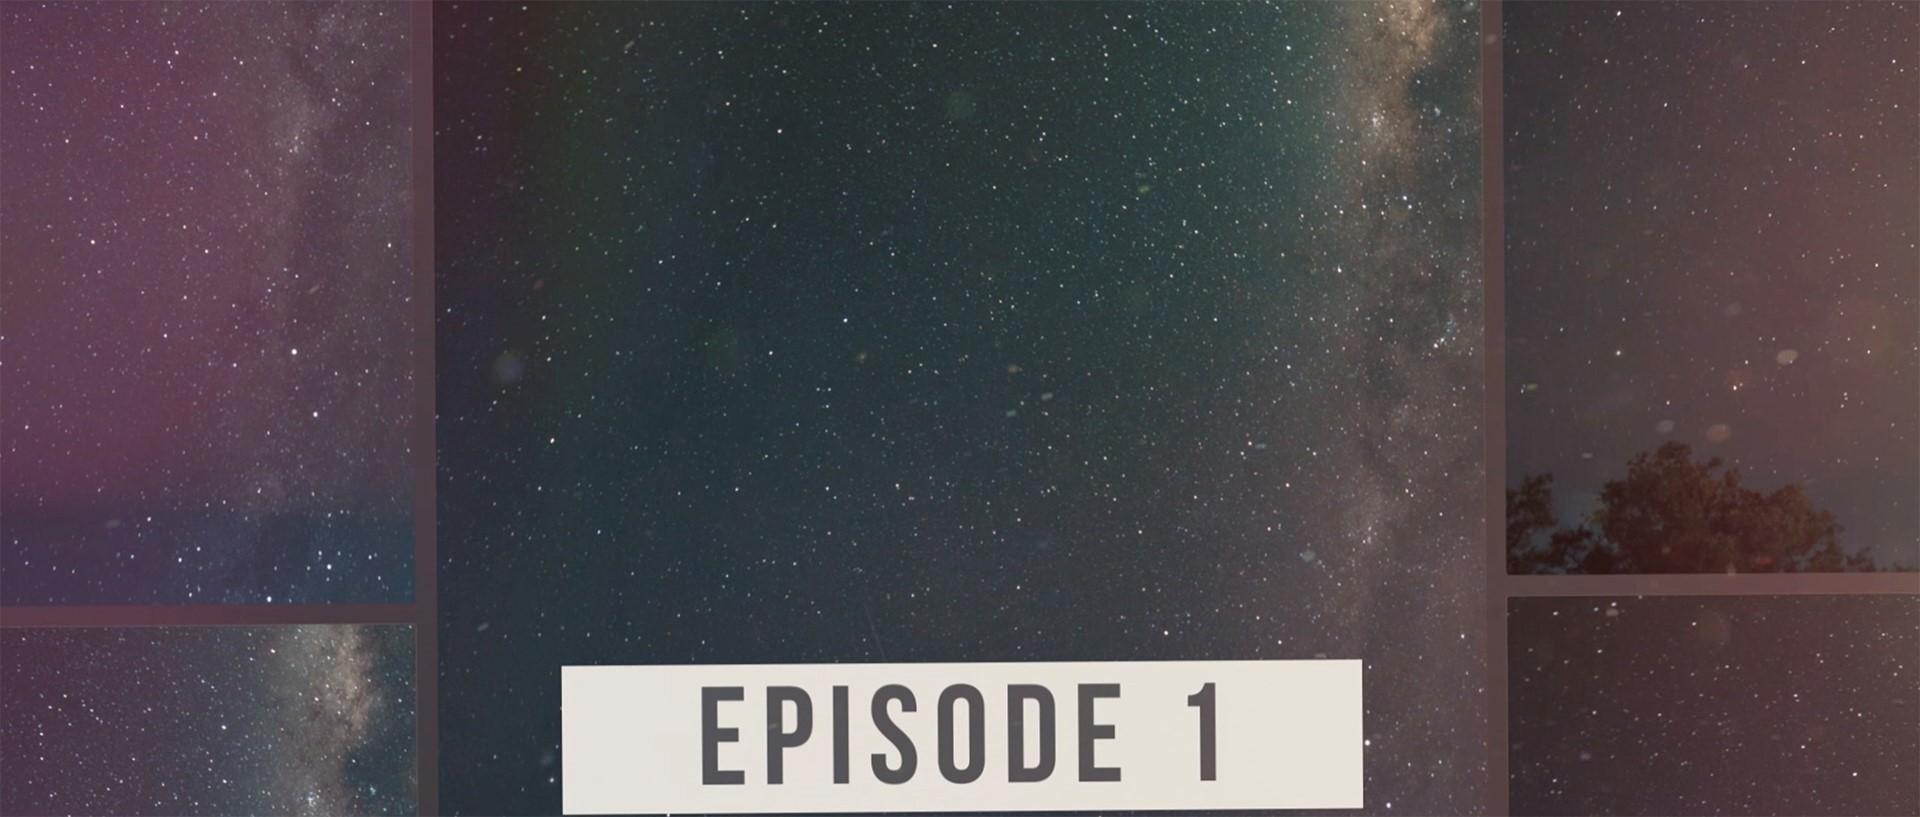 Amaroo 2017 Episode 1 opener